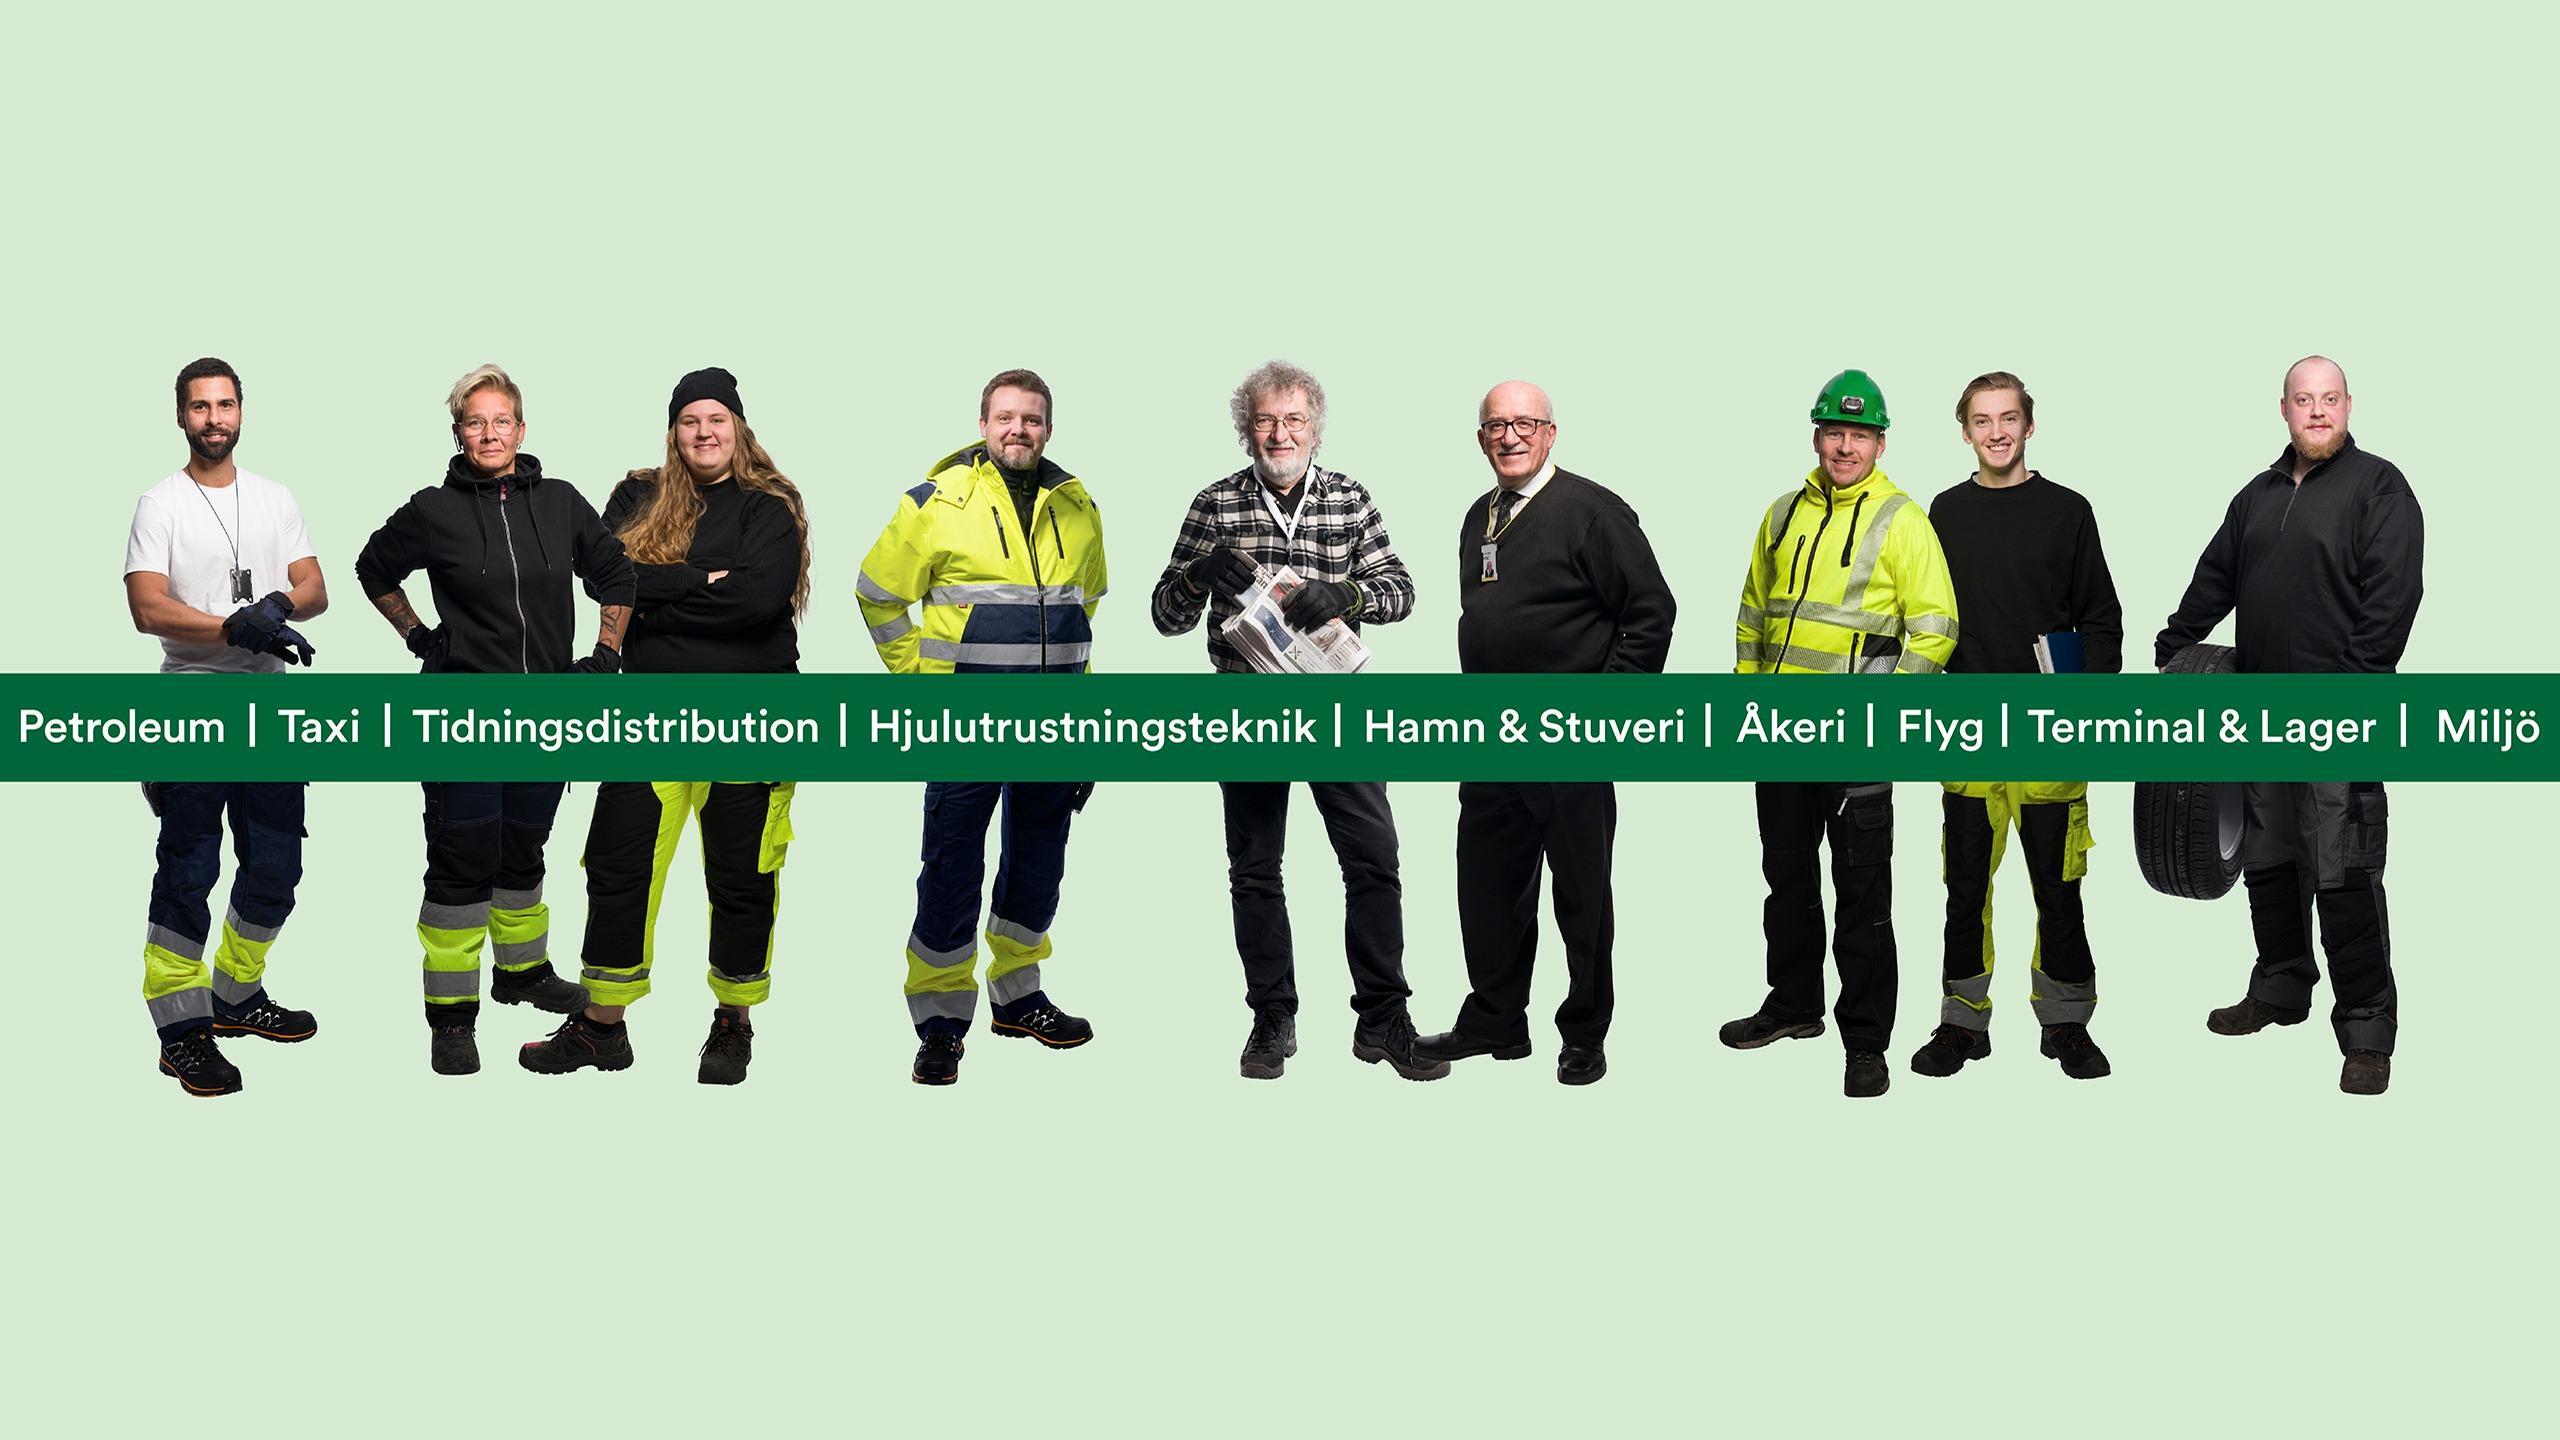 TYA, Transportfackens Yrkes- & Arbetsmiljönämnd